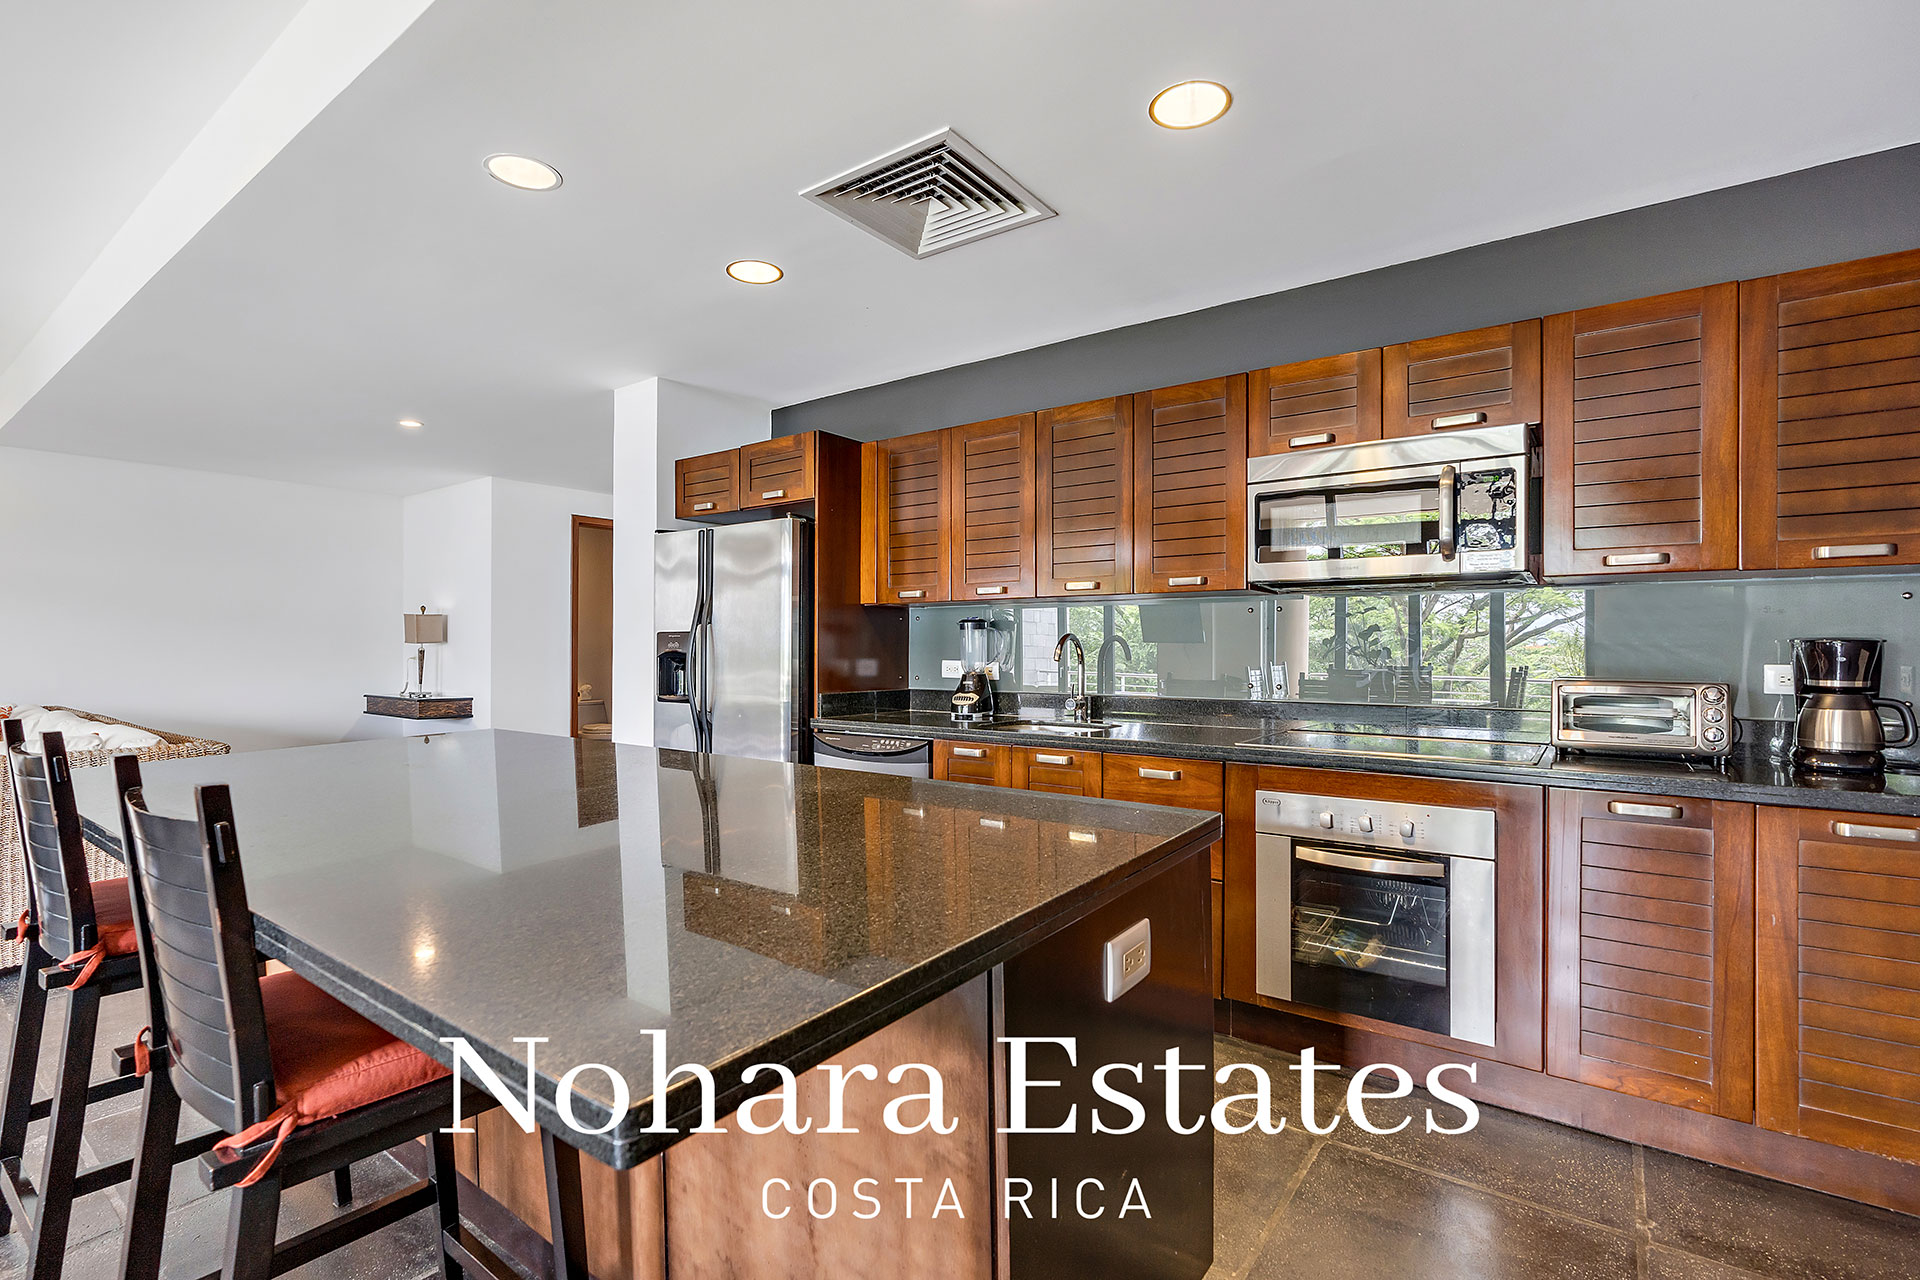 Nohara Estates Costa Rica 128 Penthouse Quepos Los Altos 7